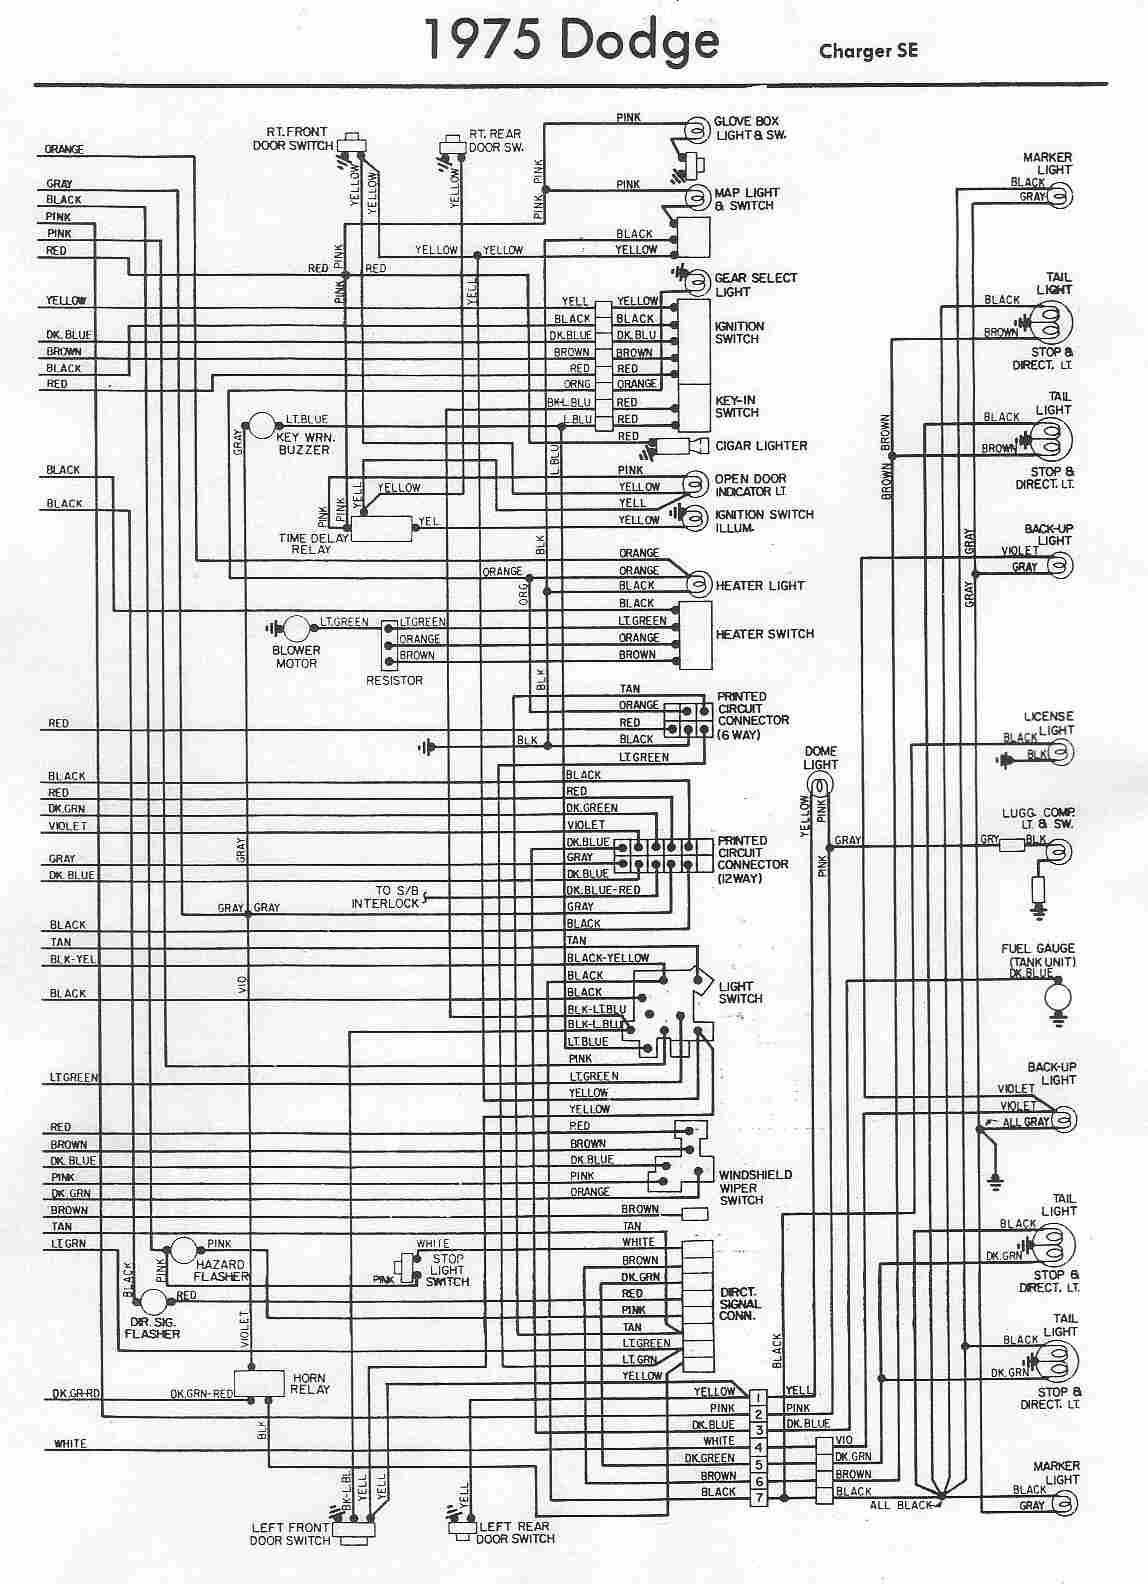 medium resolution of 1976 dodge wiring diagram wiring diagram blog 76 dodge wiring diagram